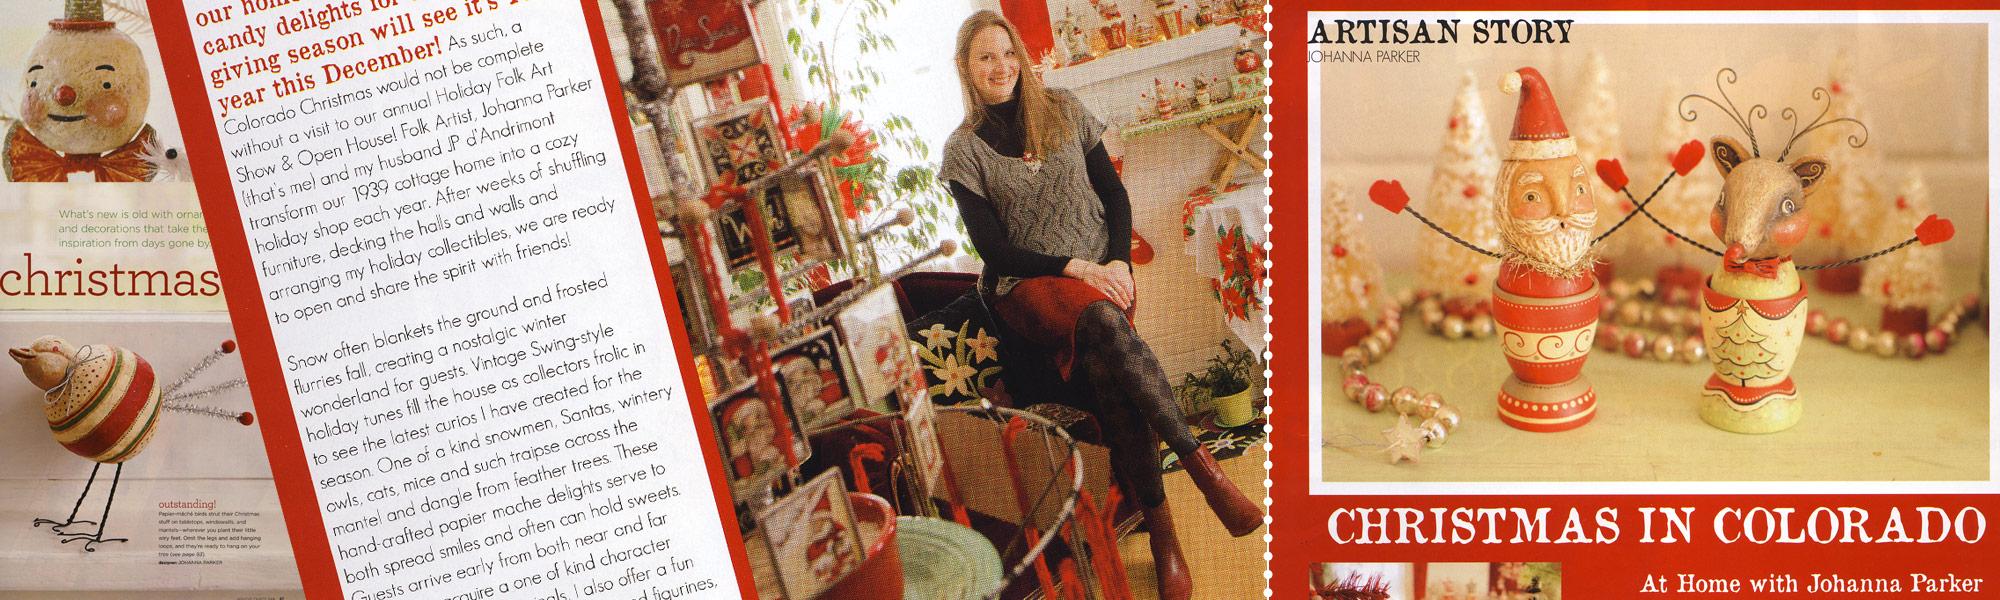 Johanna-Parker-Press-Banner-12.jpg